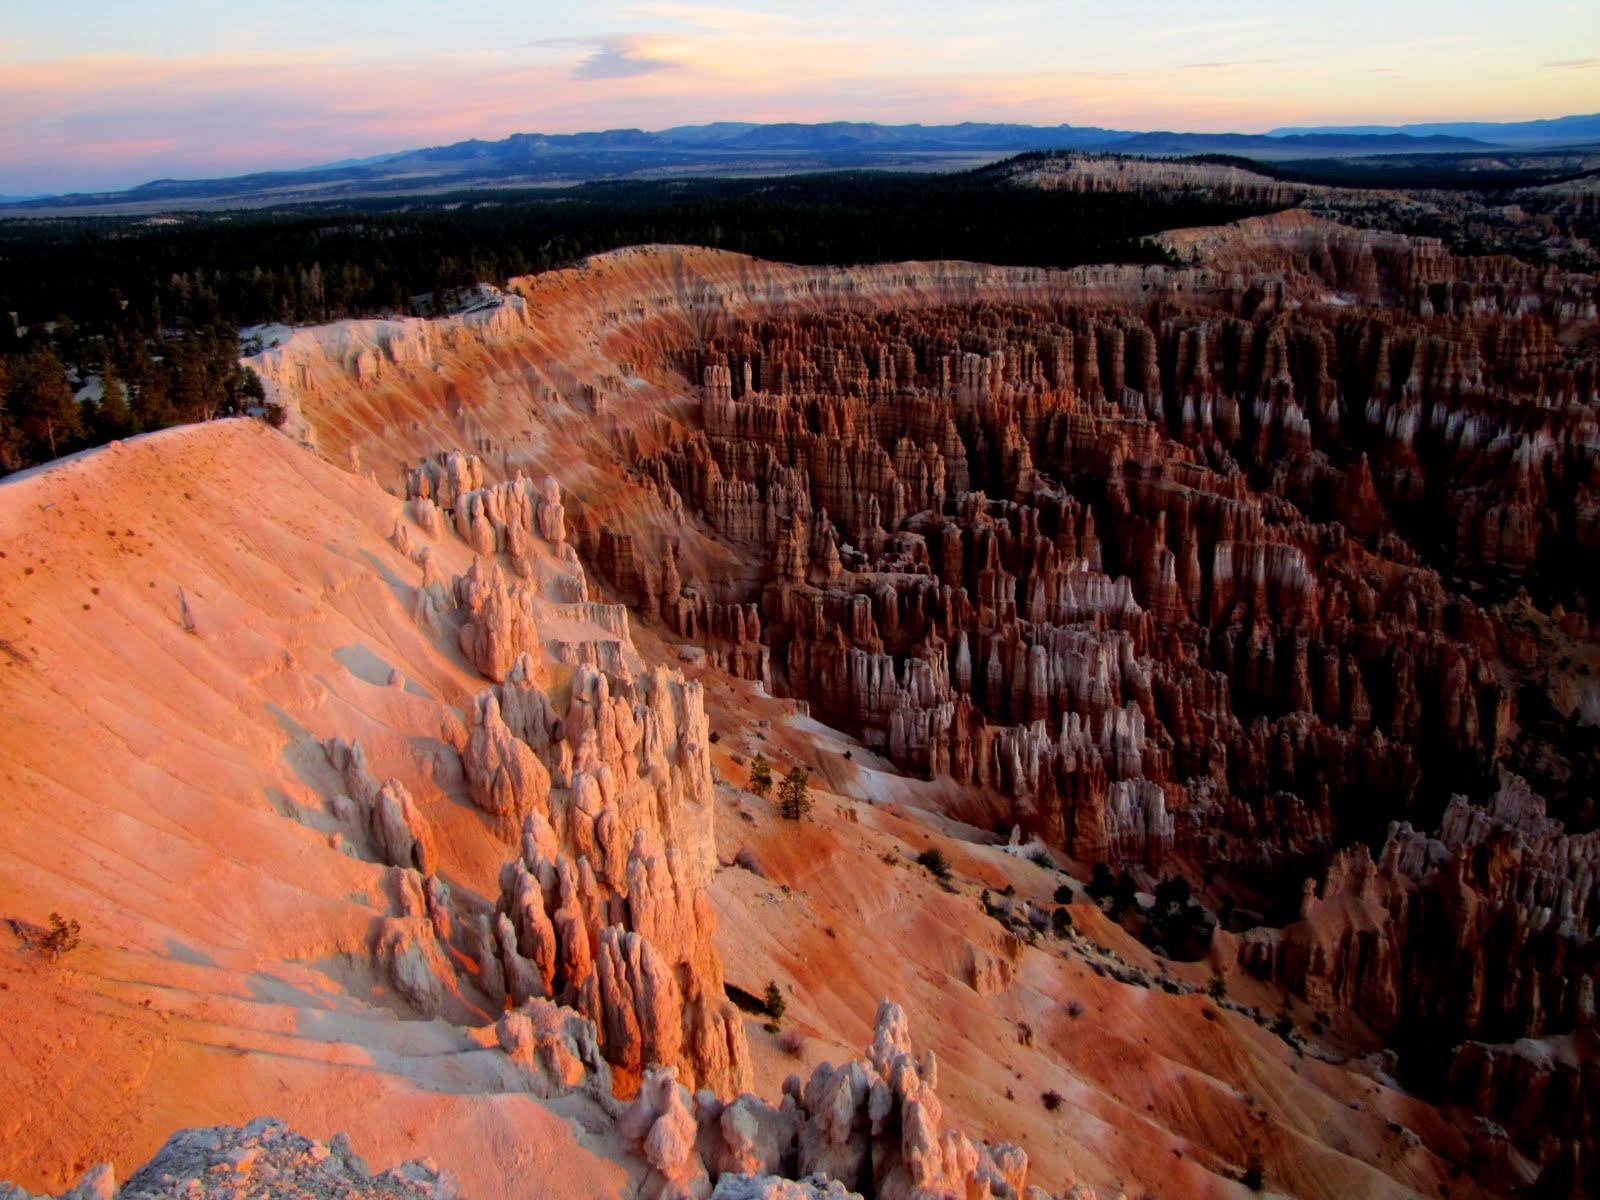 Bryce Canyon at 6:40am, the Sunrise